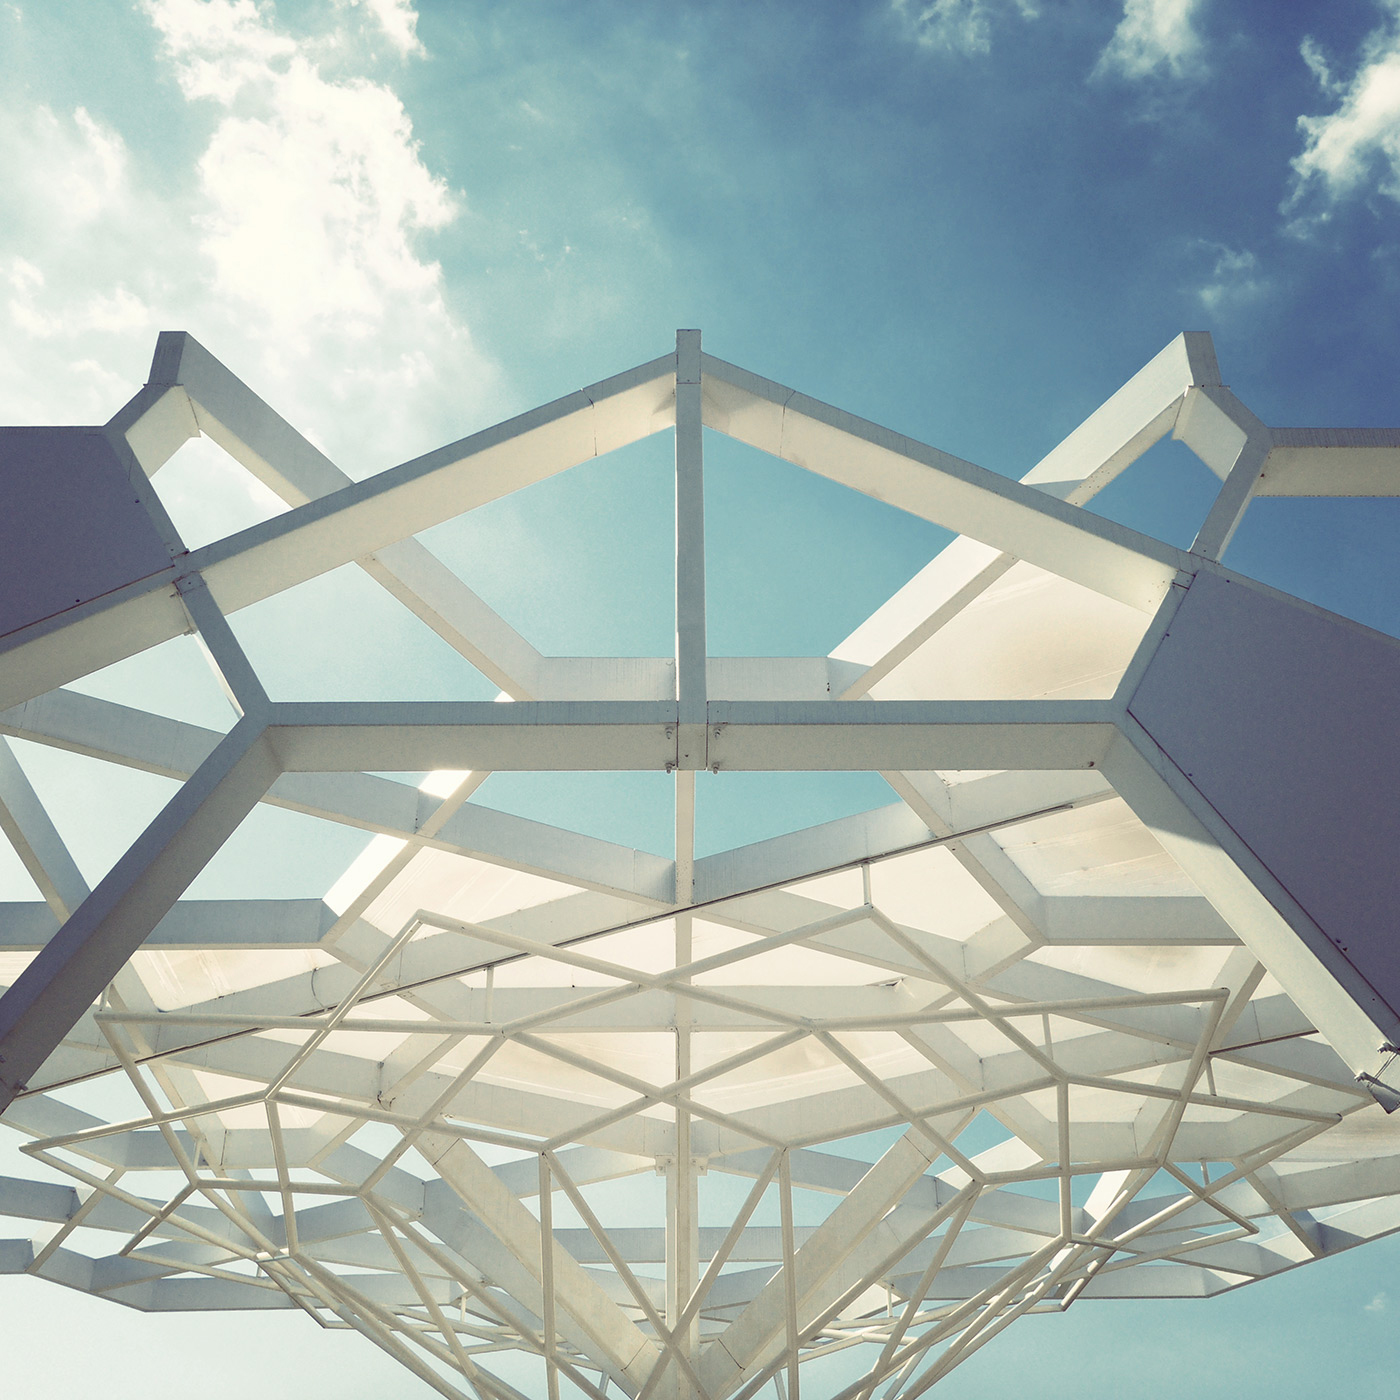 Turkish Pavilion Expo 2015 <br />Location: Milano, Italy <br />Architects: Genius Loci Architettura